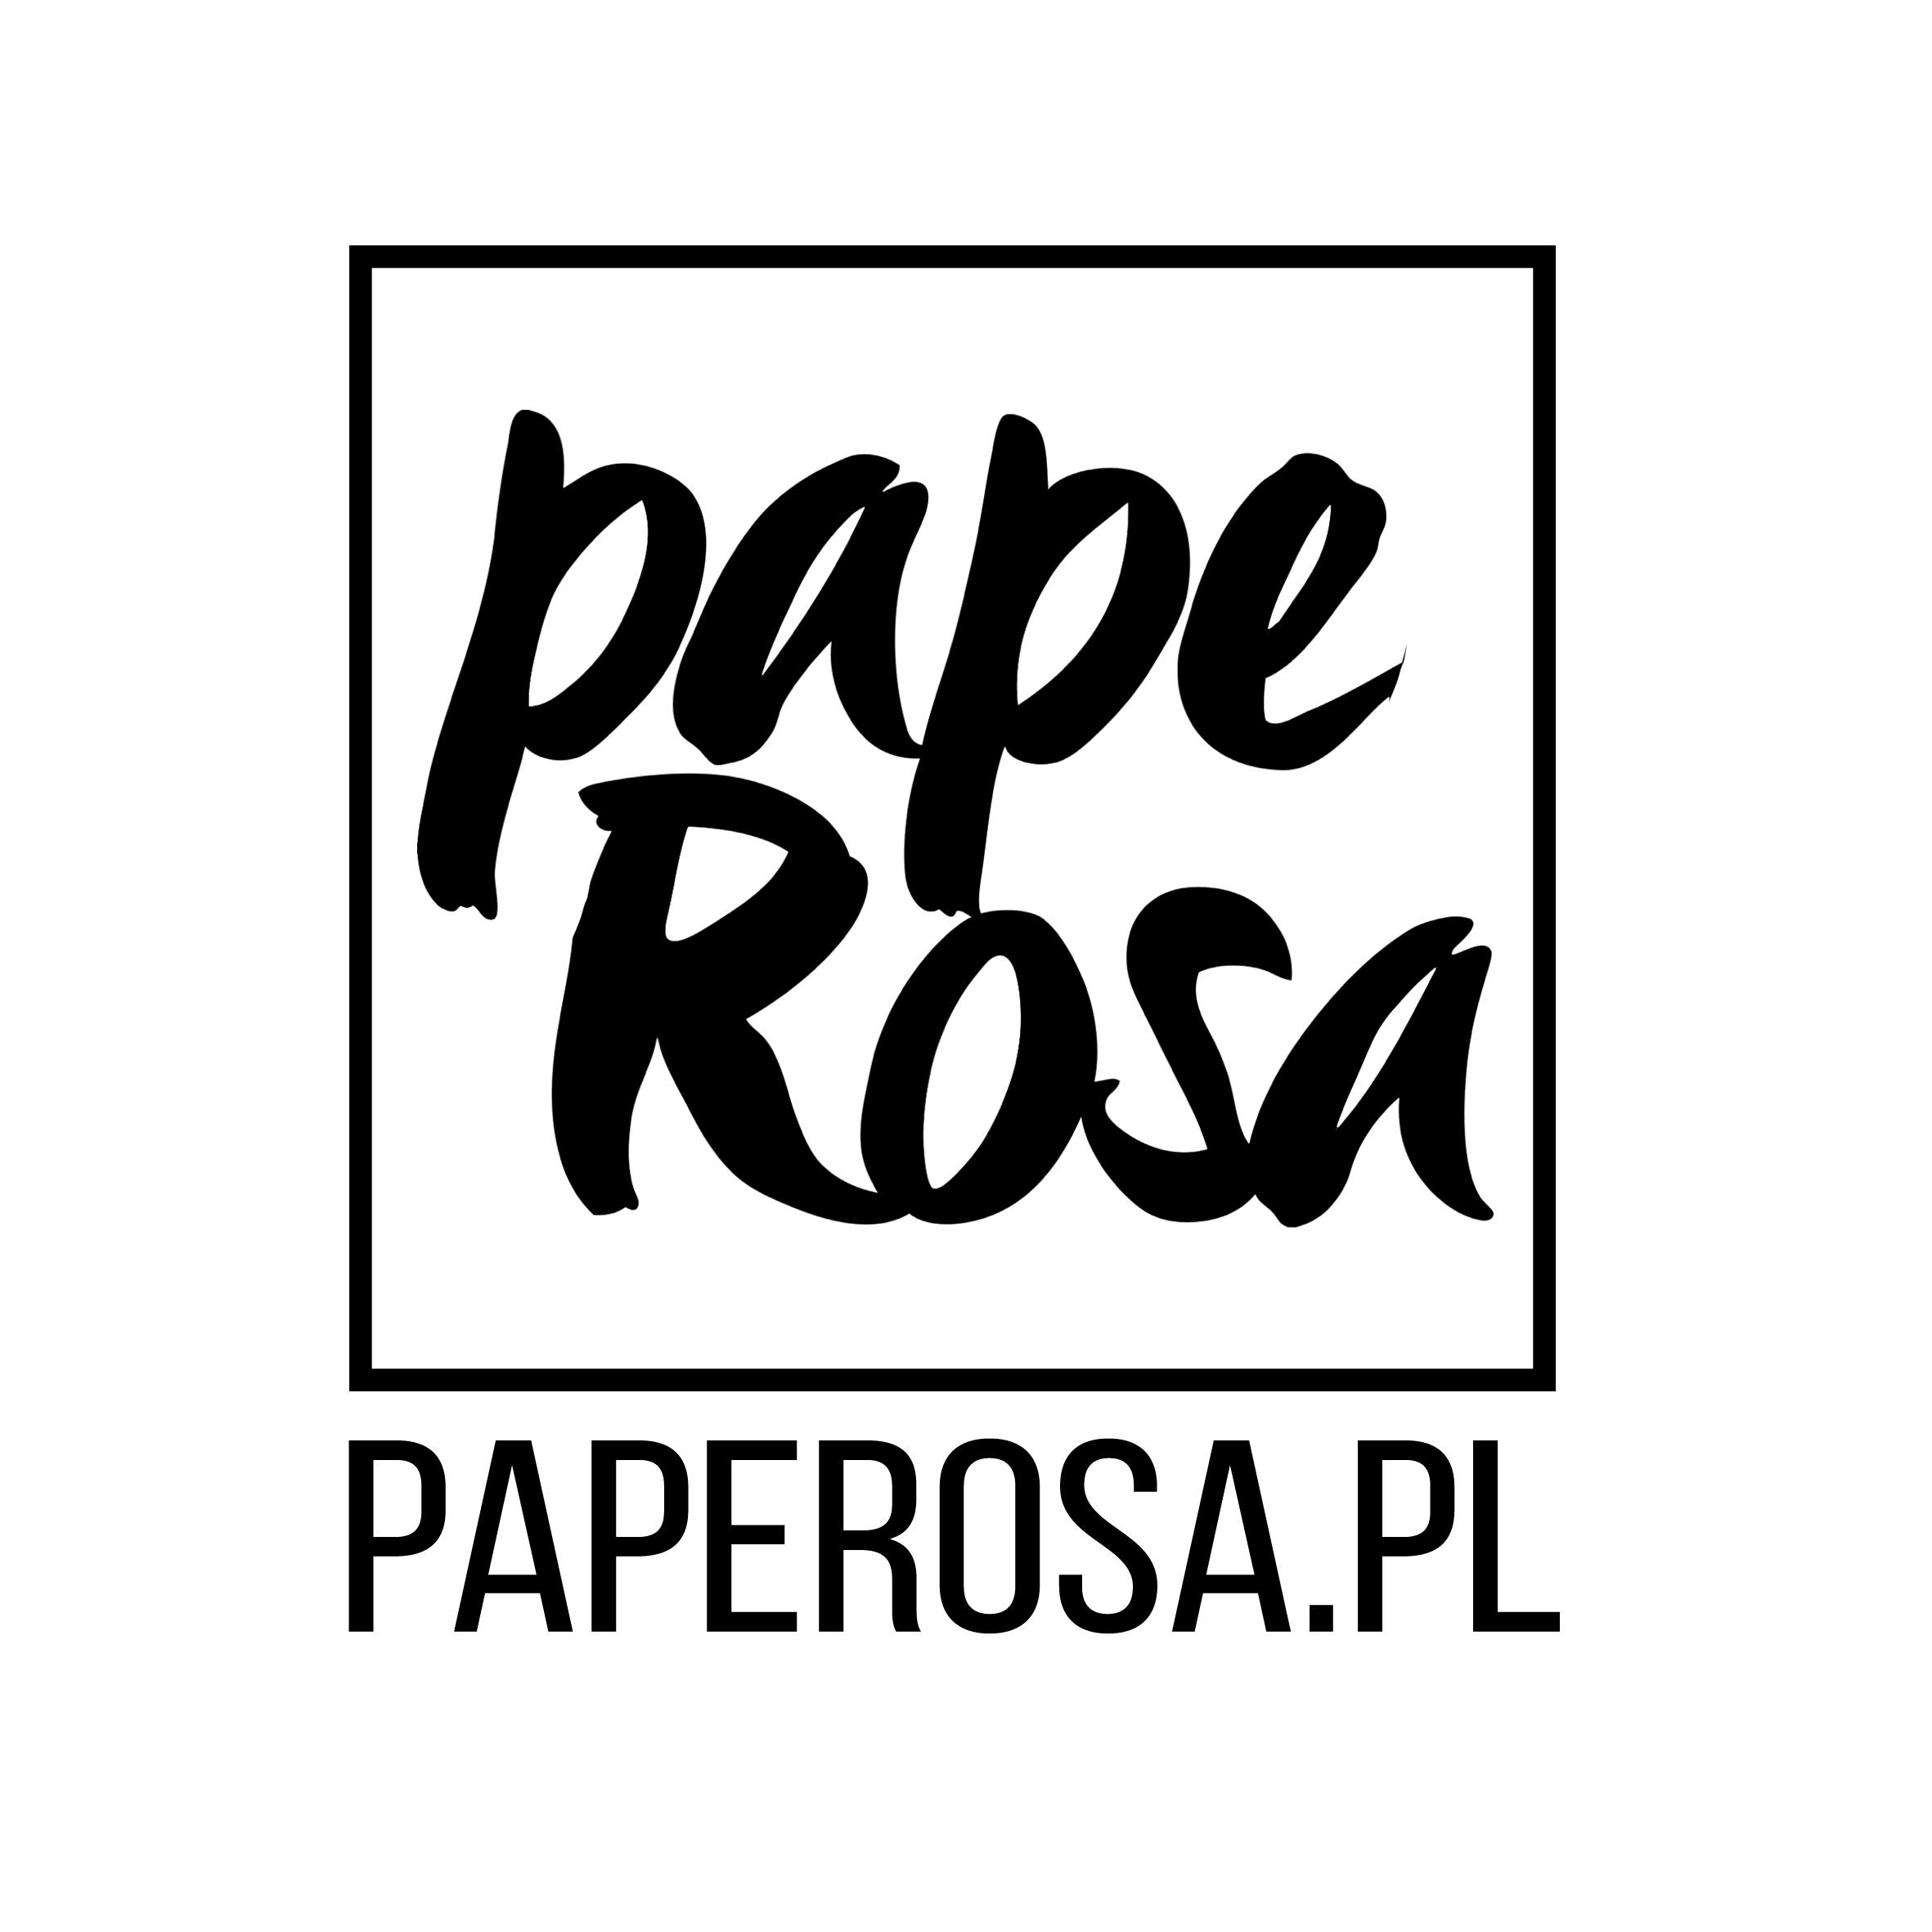 papeROSA